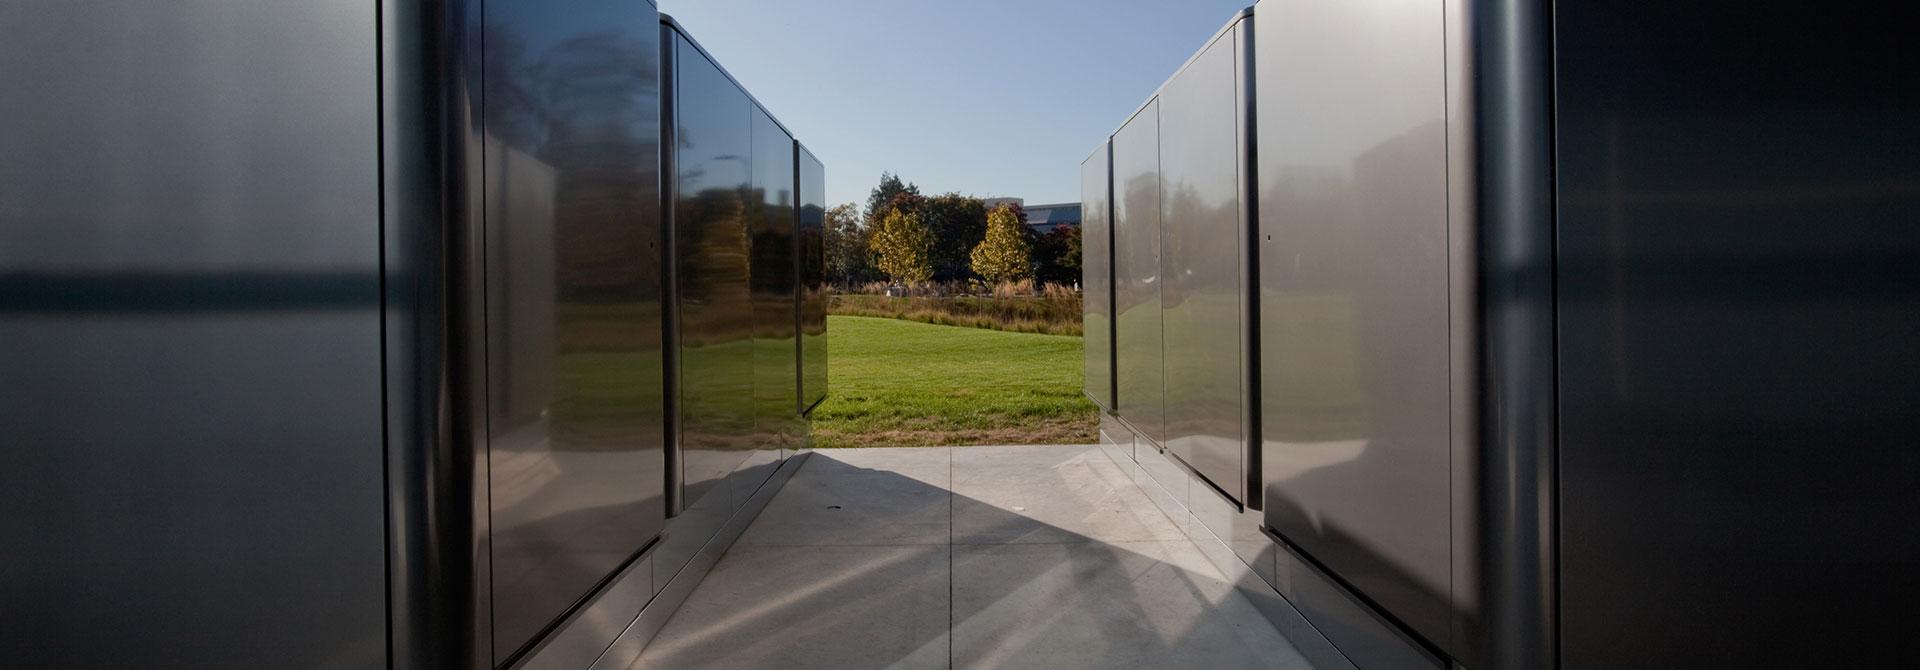 bloom-box-modular-build